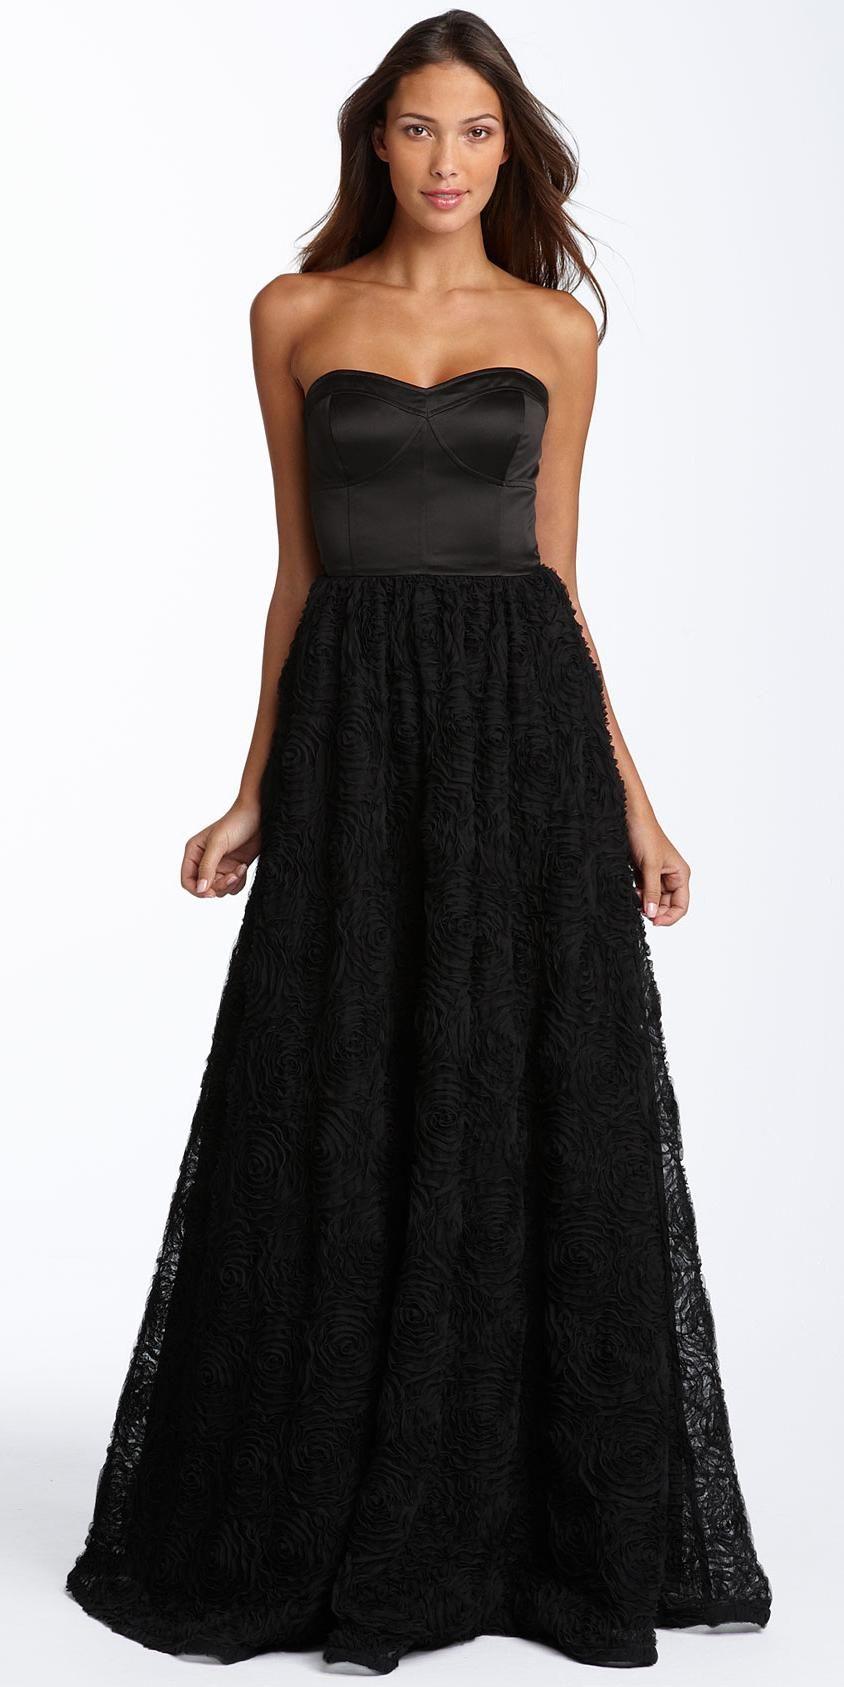 Black Evening Dress Black Evening Dresses | fashion | Pinterest ...